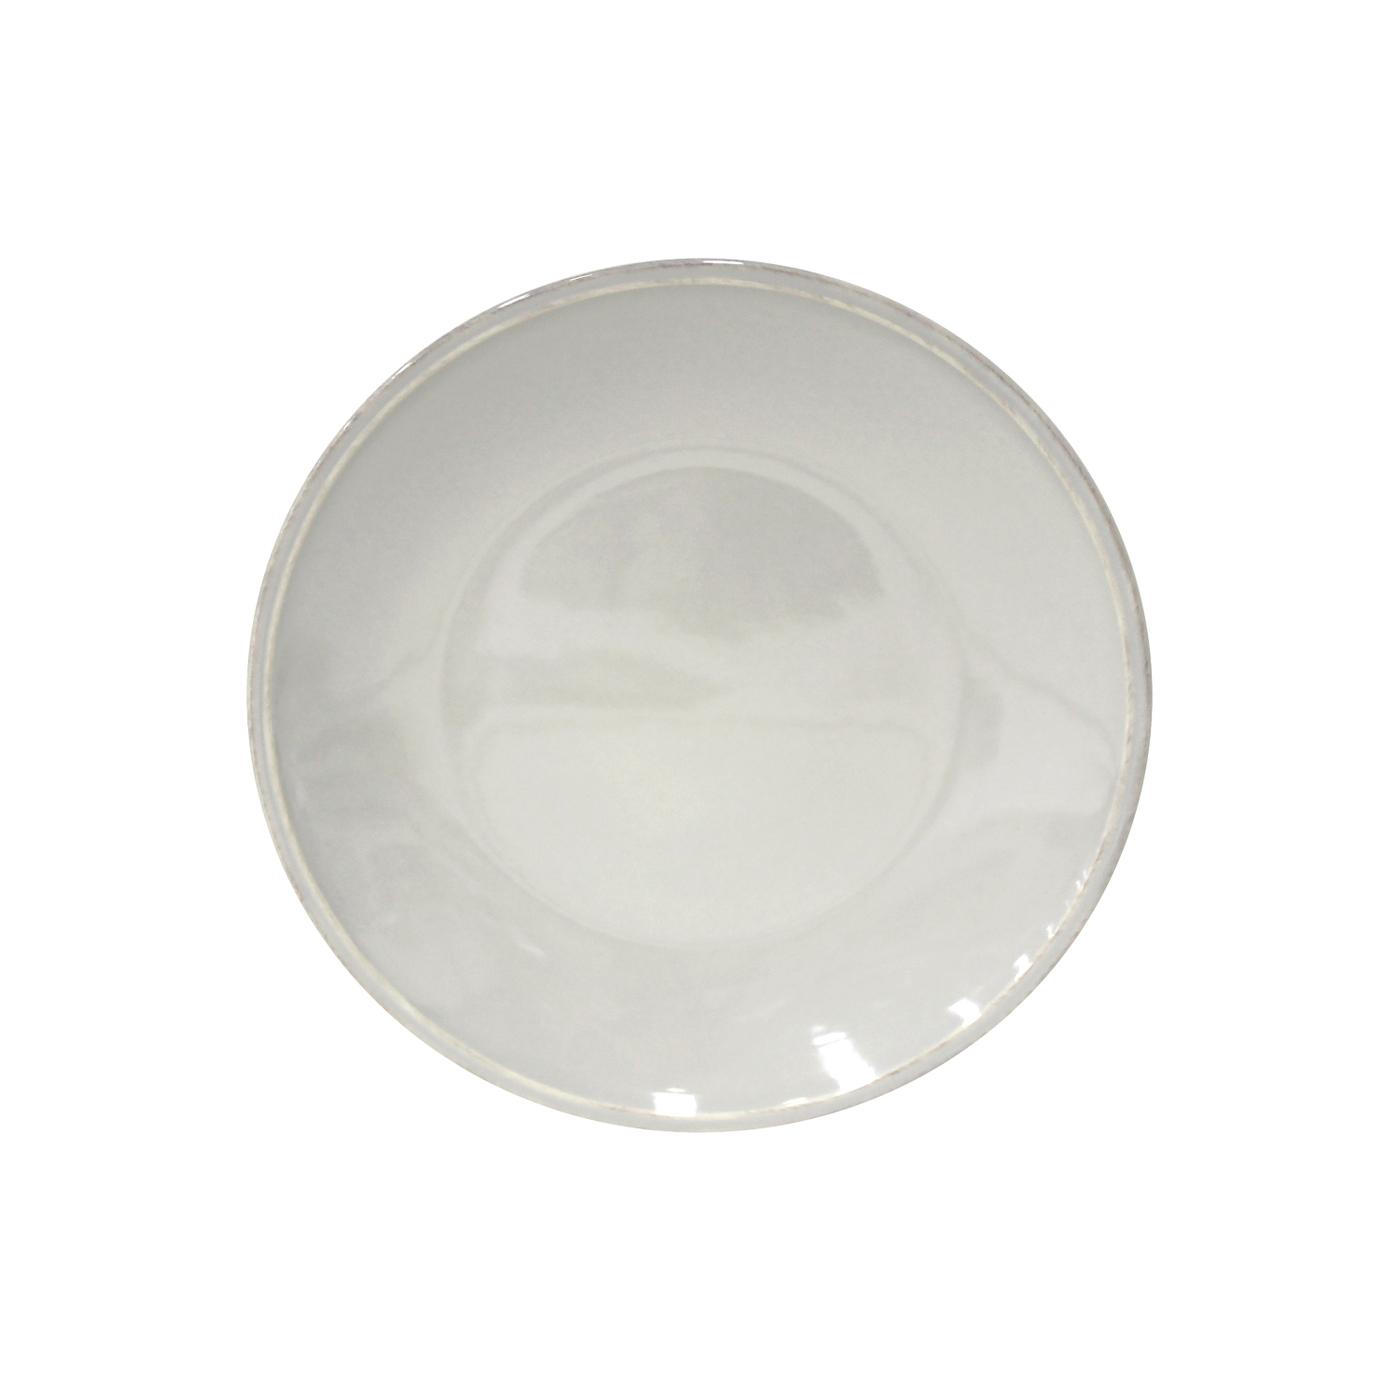 Costa Nova Friso Grey Dinner Plate, Set of 6